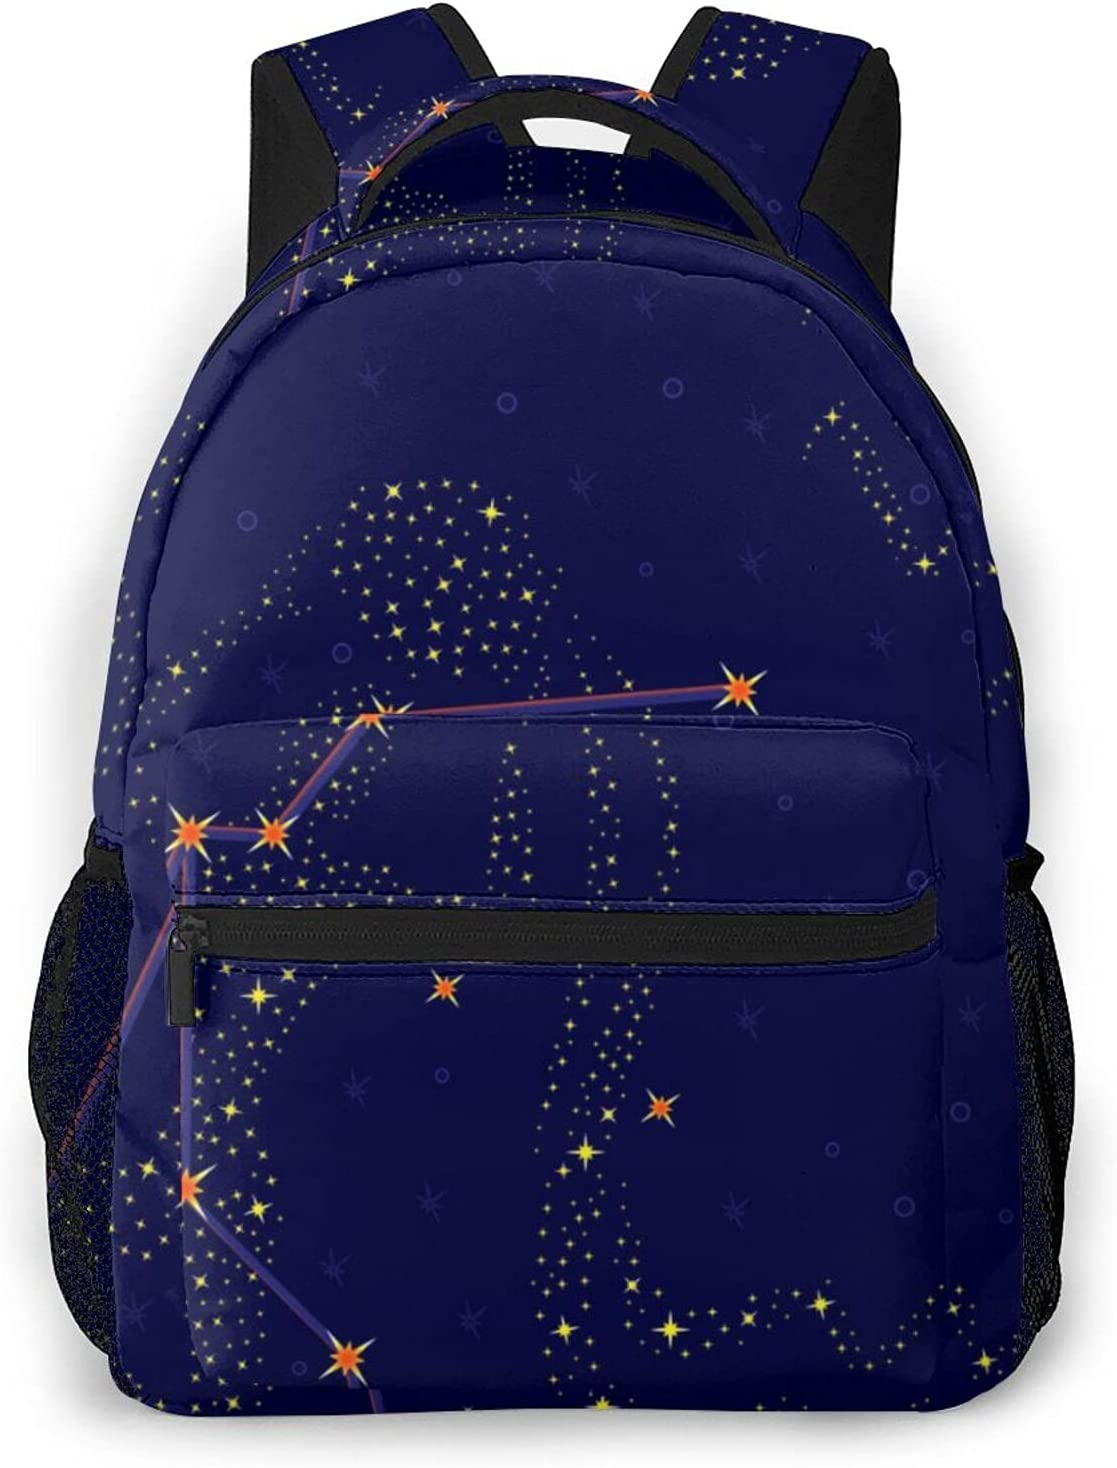 School Genuine Backpack For Girls Boys Seattle Mall Elemen Durable Middle Lightweight